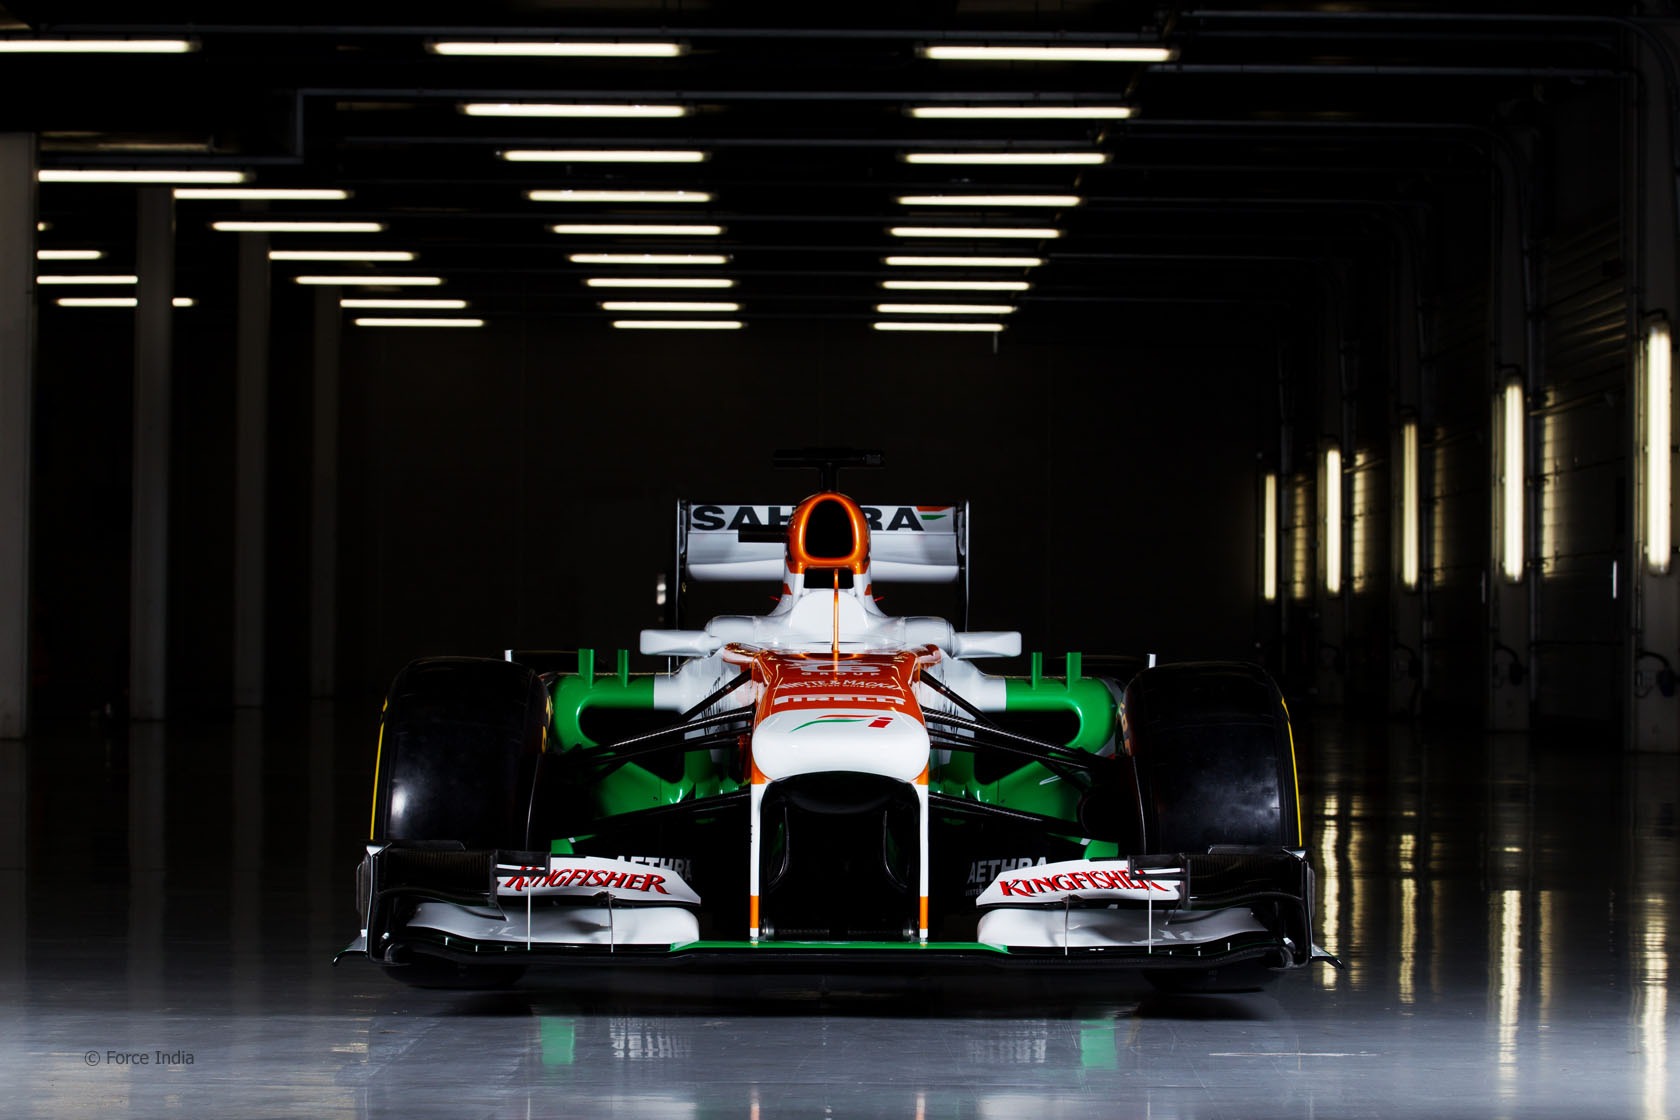 Sahara Force India F1 Zoom Background 5